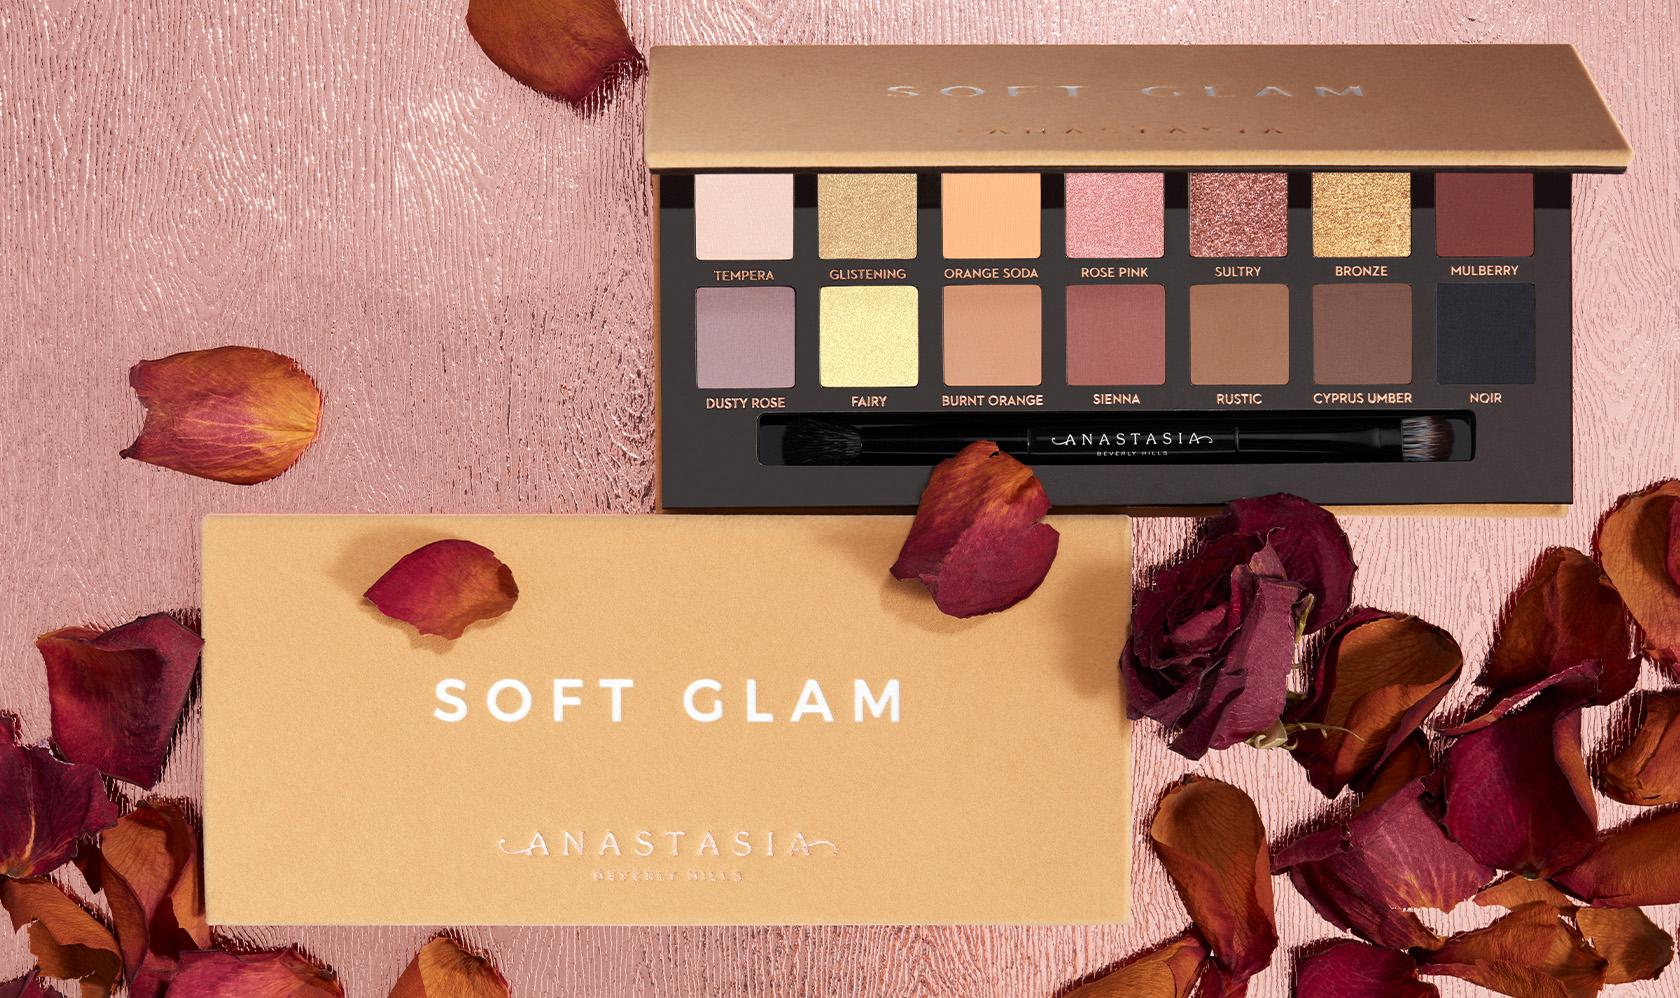 abh-soft-glam